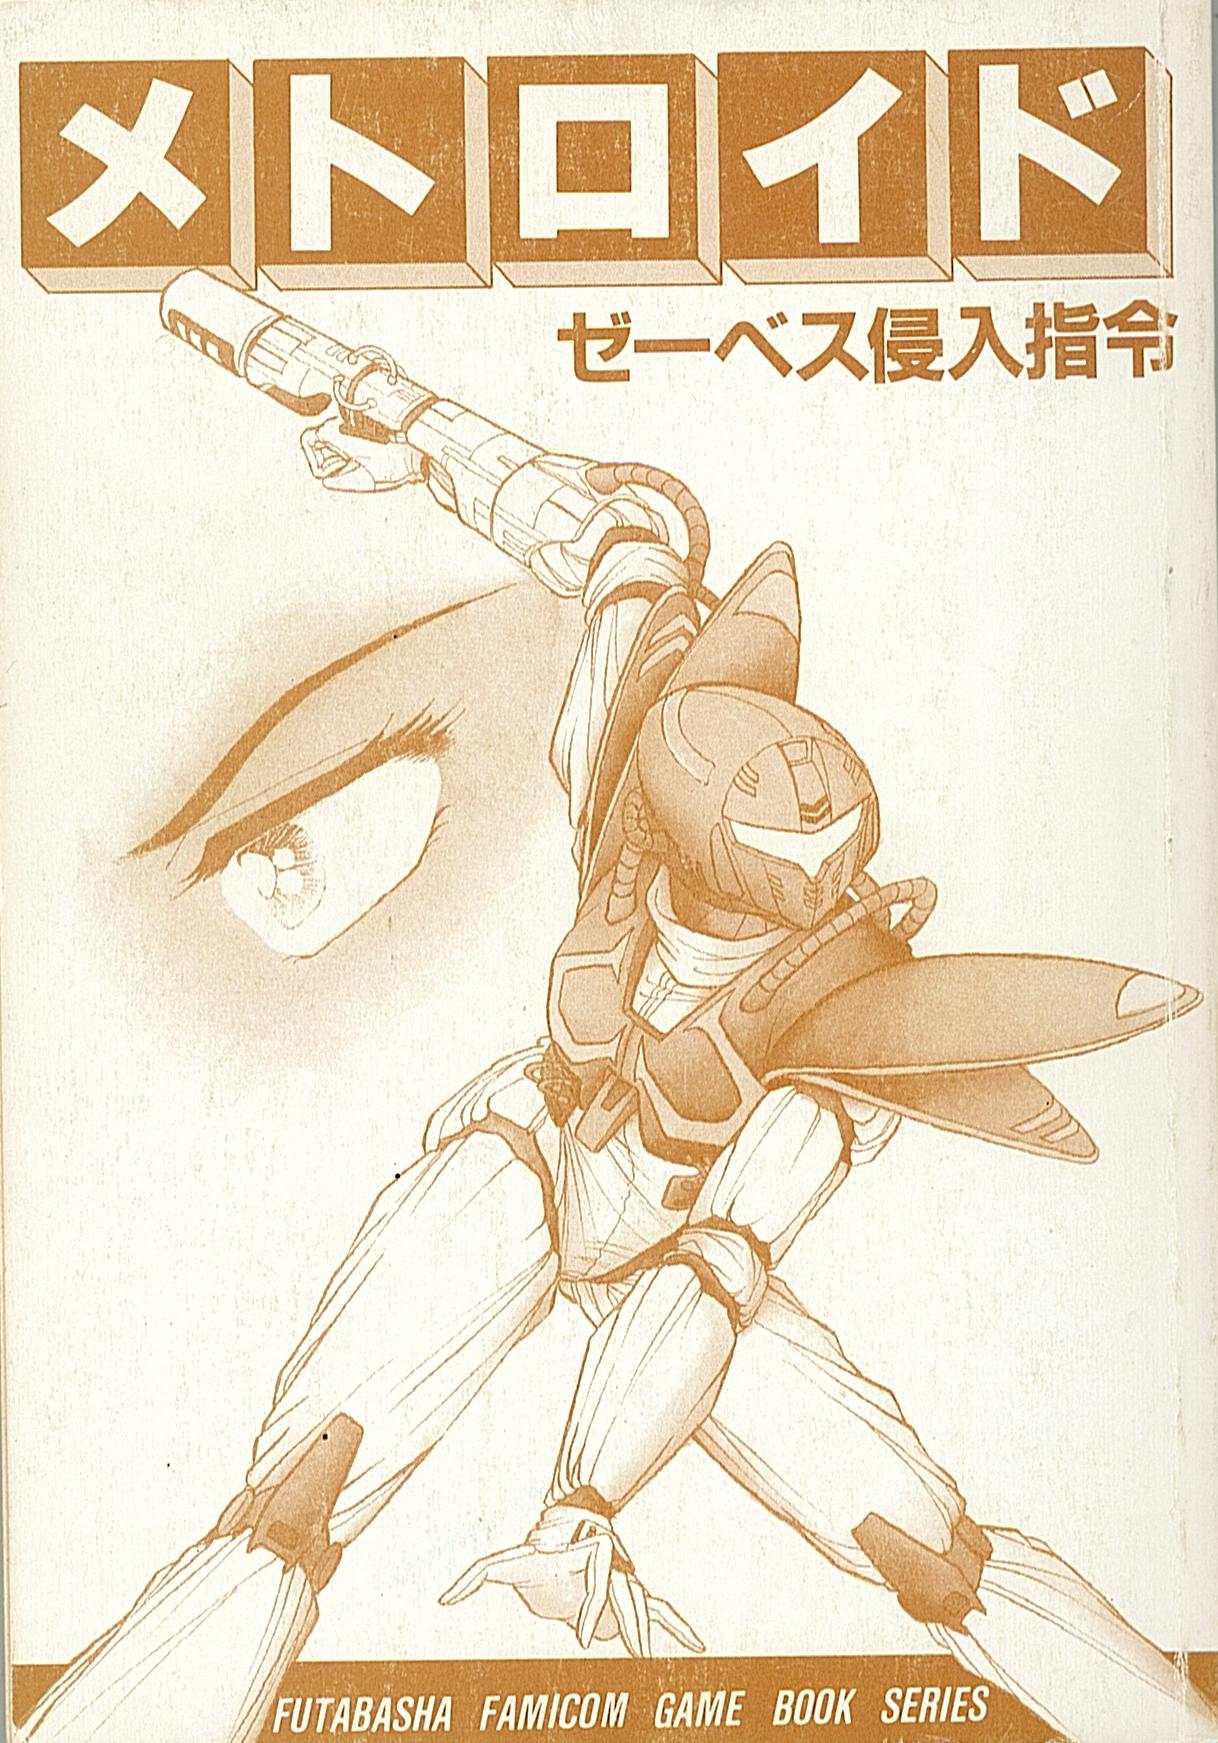 Metroid: Zebes Invasion Order